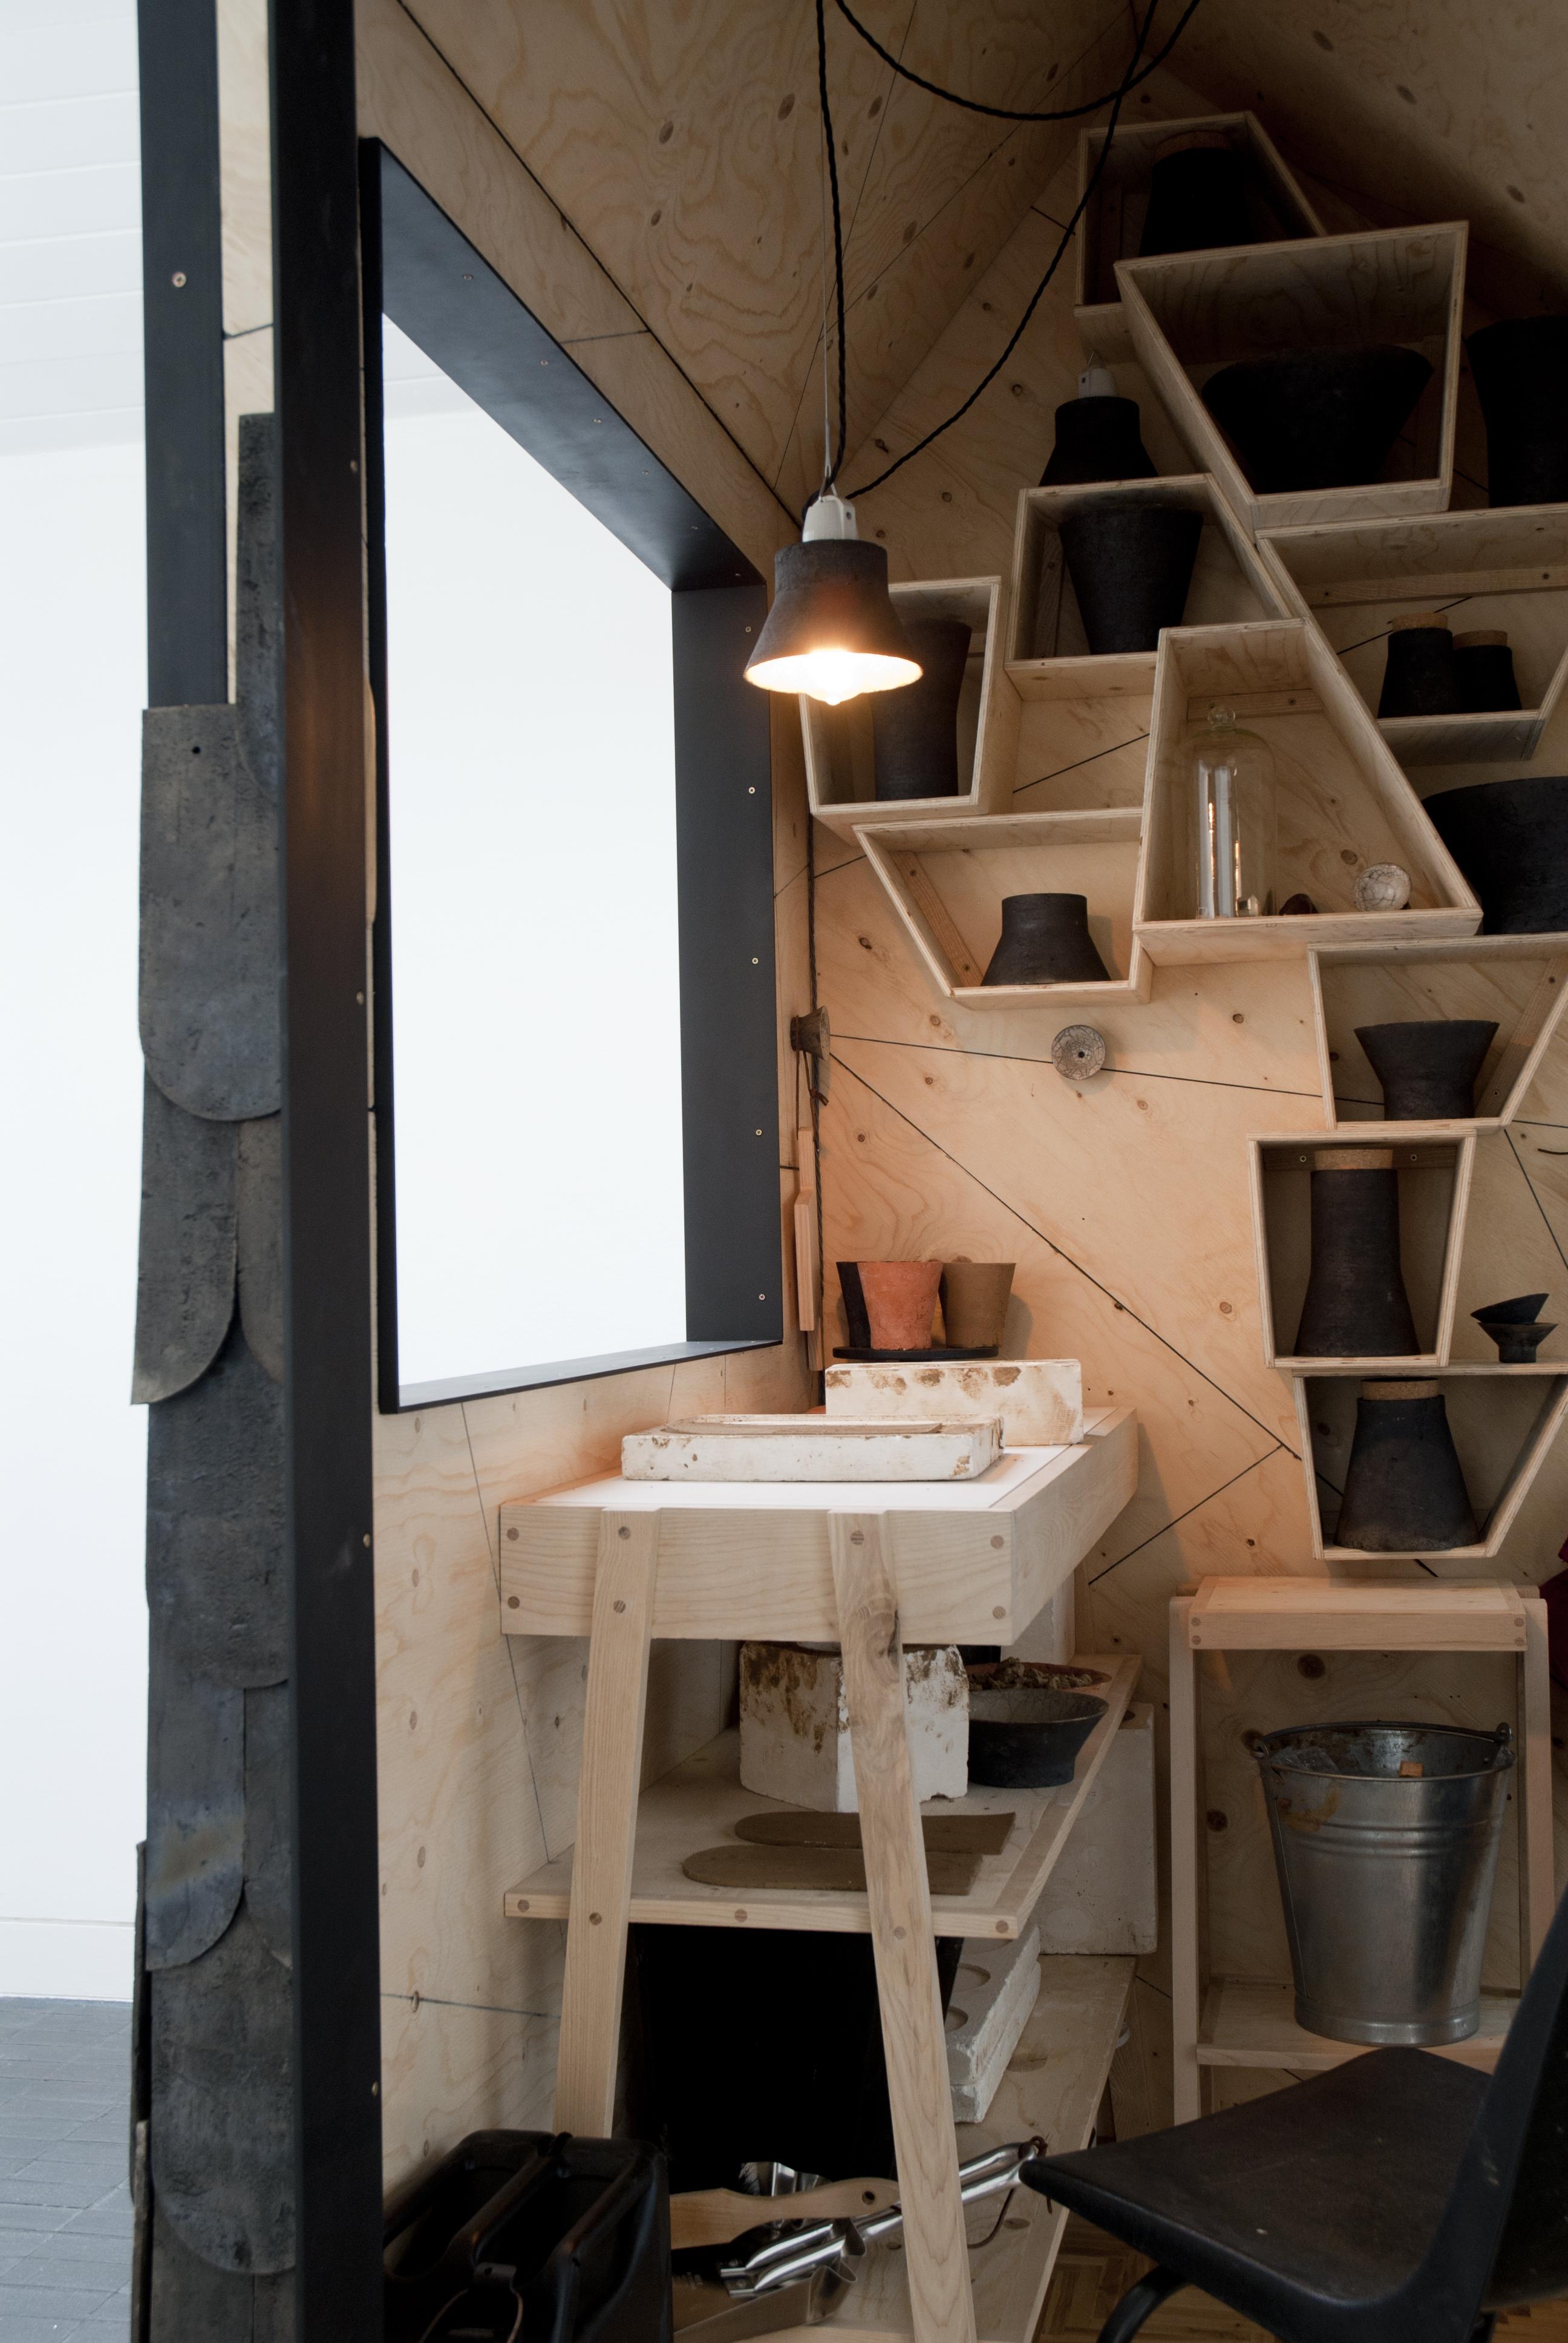 3. Kiln house detailimagecourtesy WillShannon